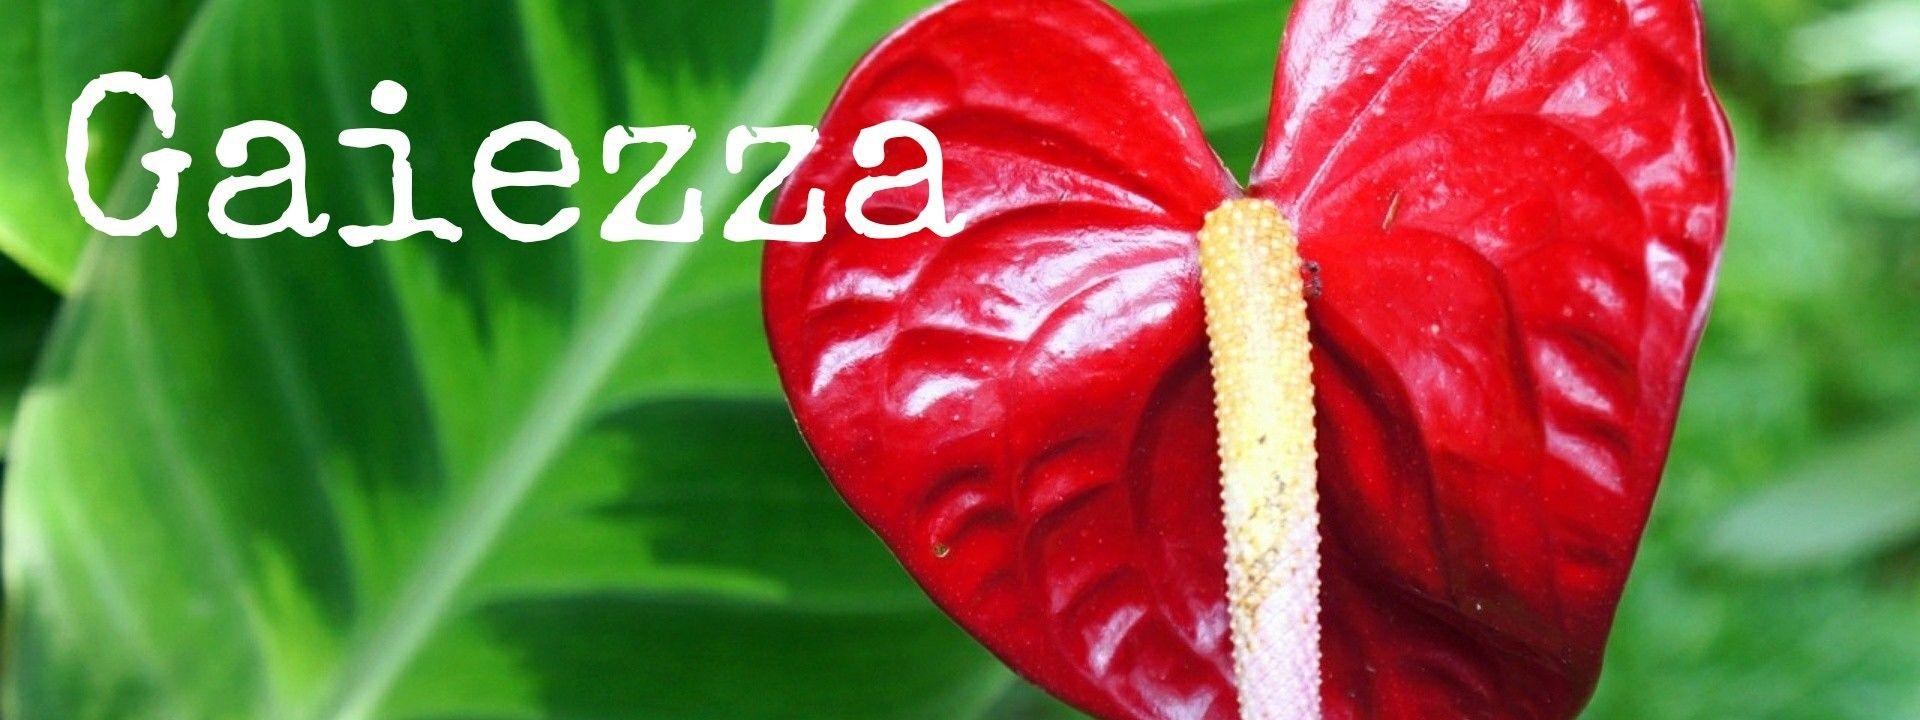 Gaiezza